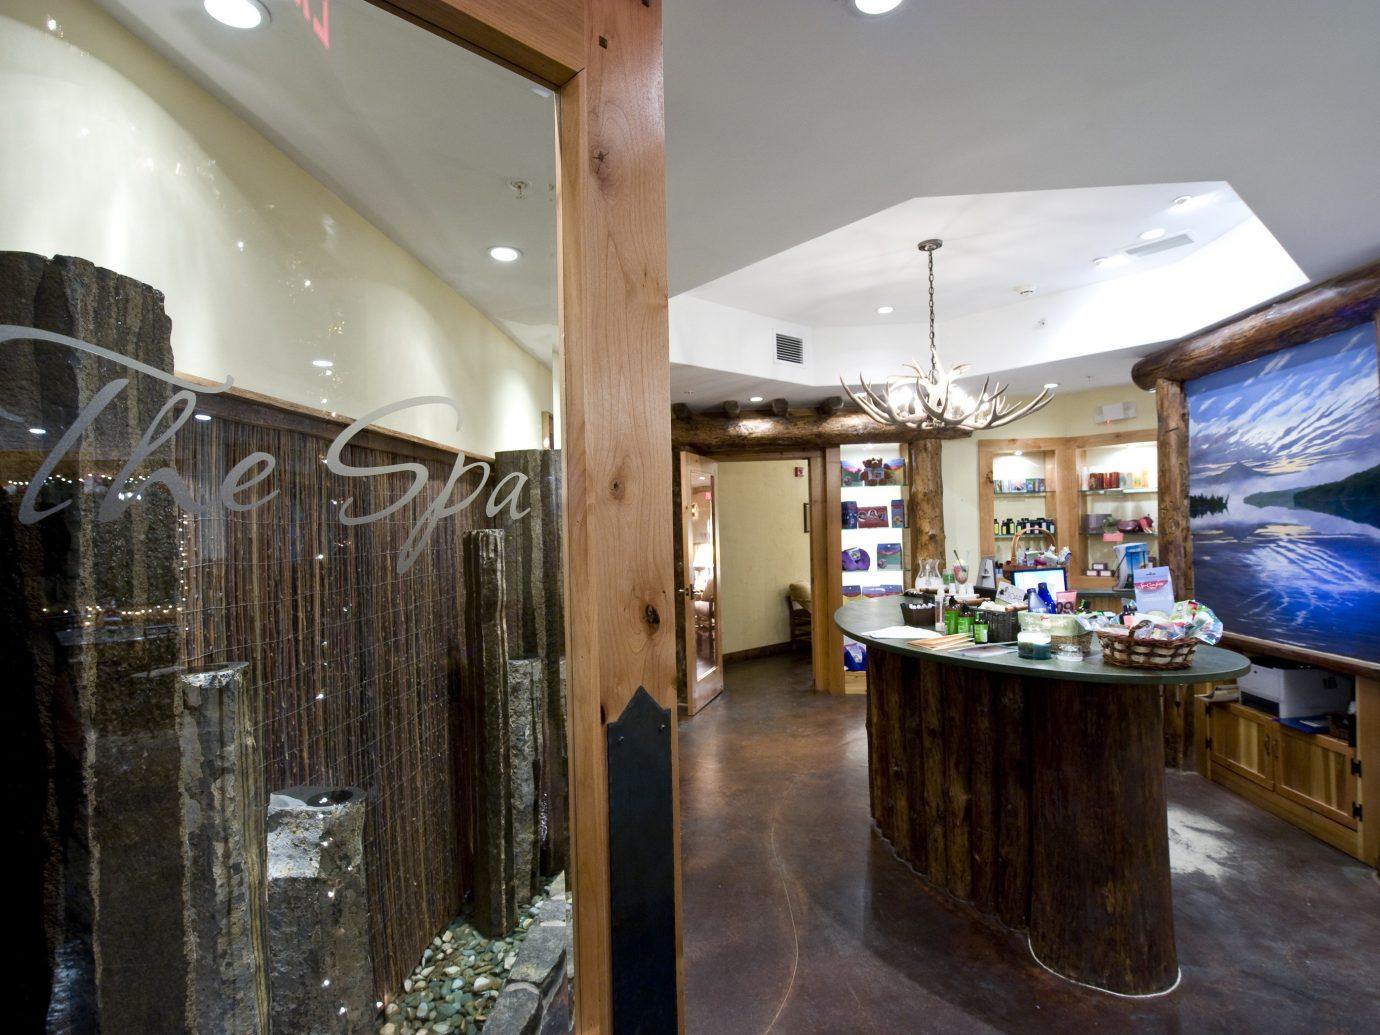 Health + Wellness Spa Retreats Trip Ideas indoor wall floor property room ceiling estate Lobby interior design restaurant wood